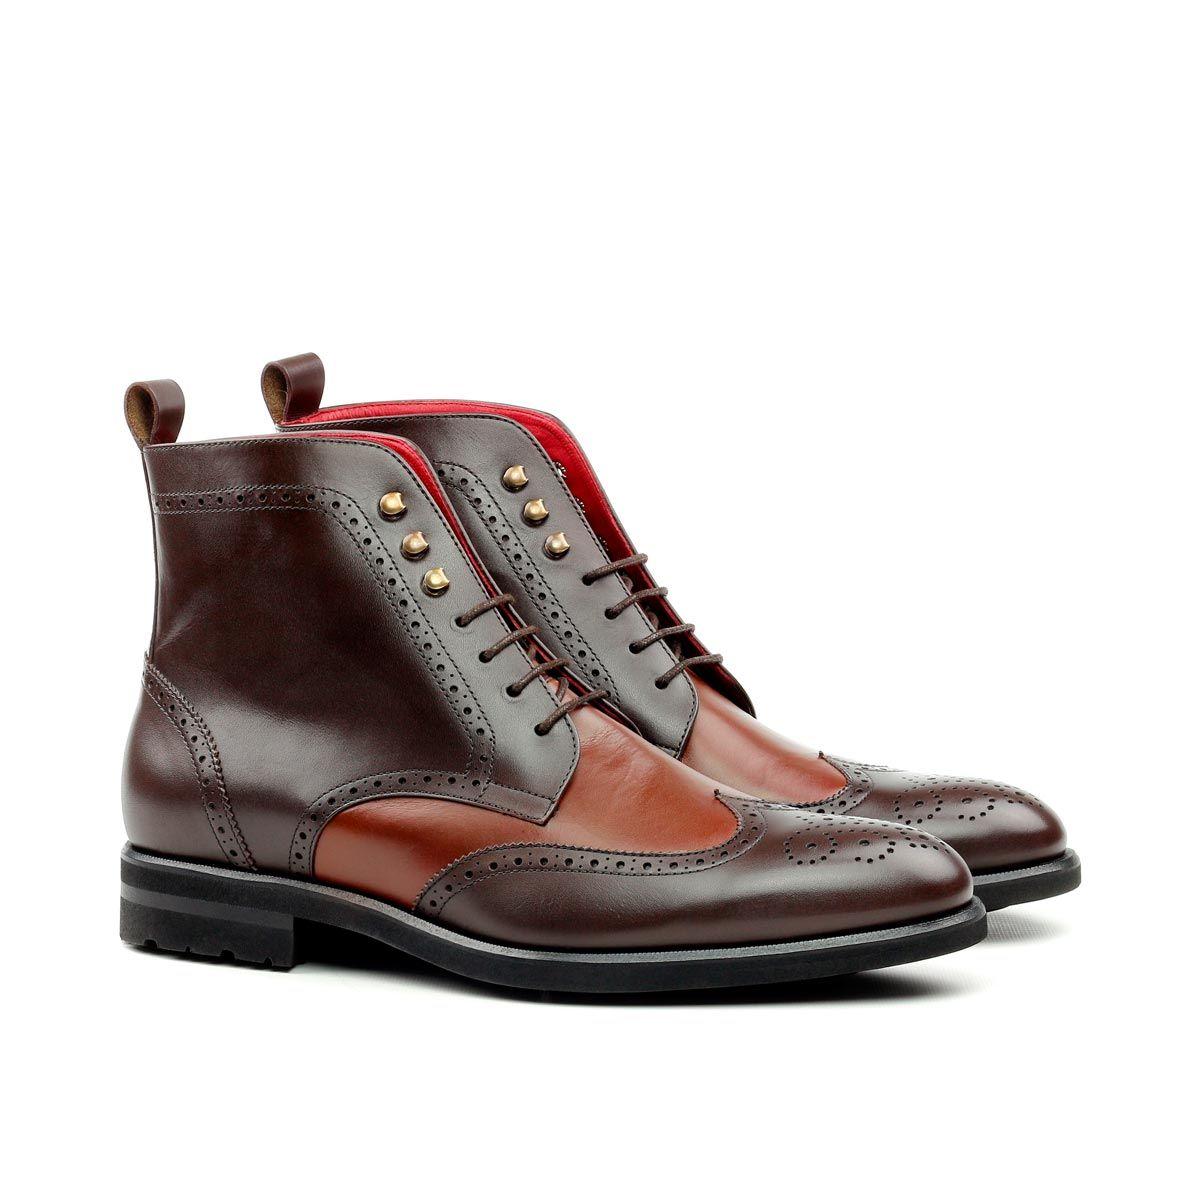 Custom Made Men's Military Brogue Boots